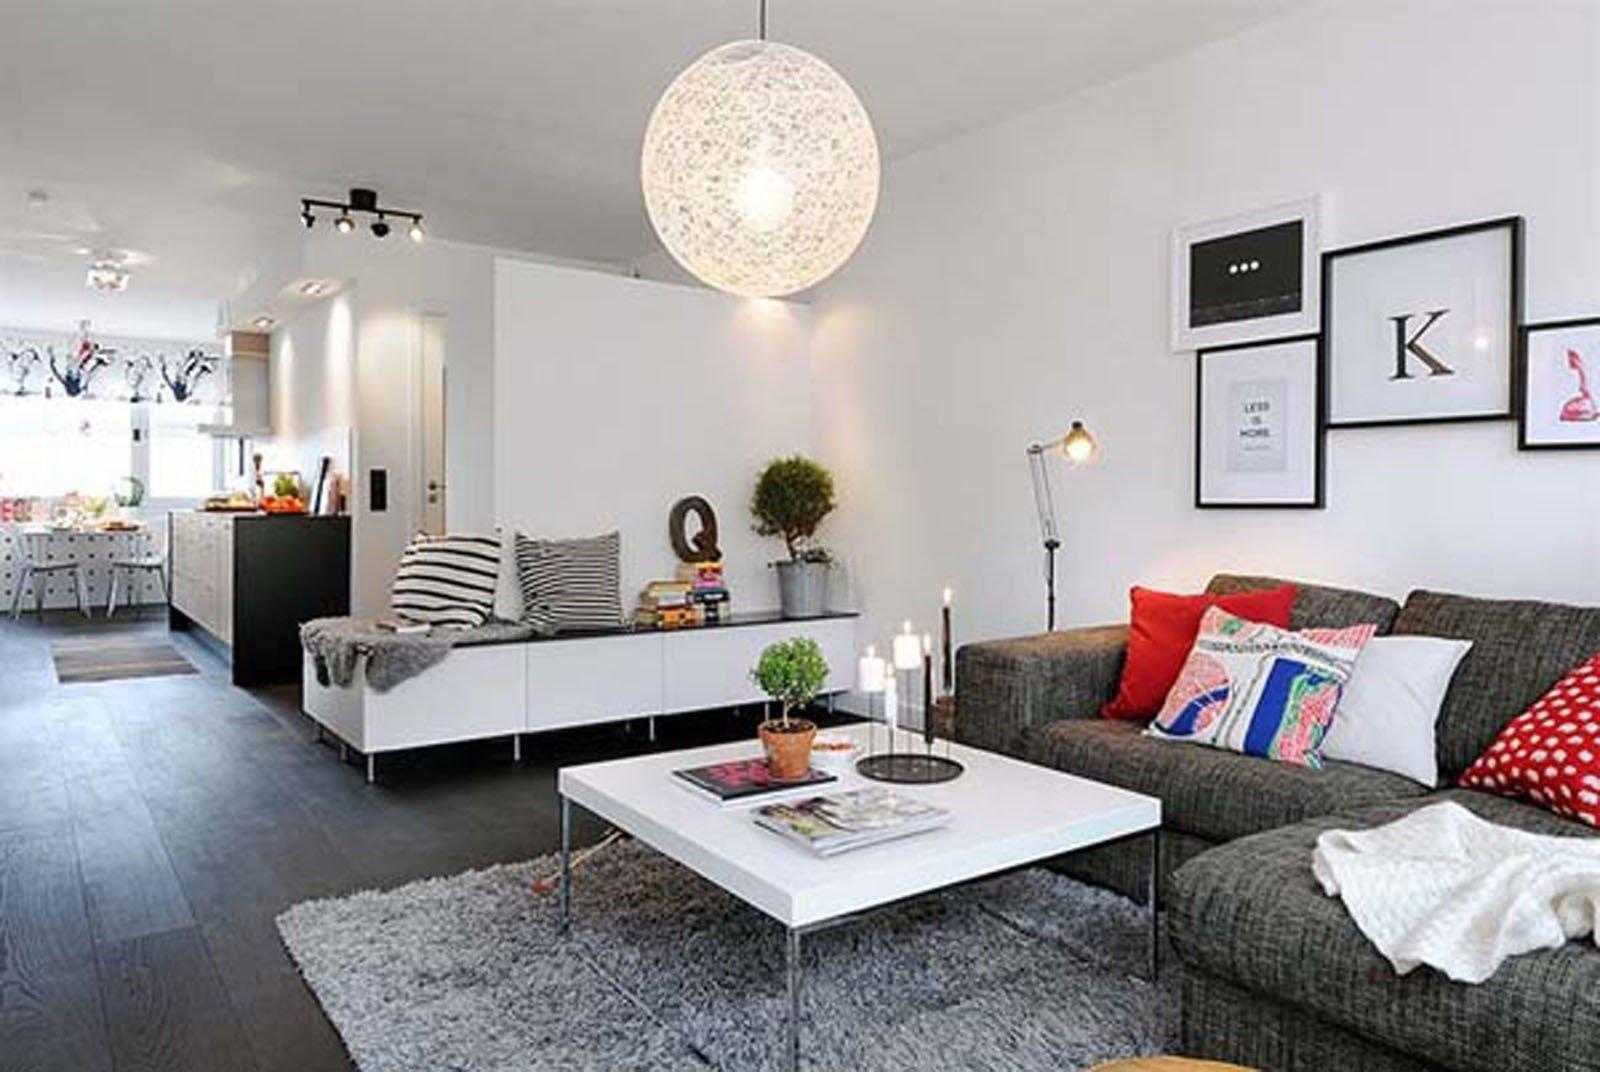 10 Pretty Decorating Ideas For Studio Apartments ikea small apartment design small living room color ideas decorating 2020